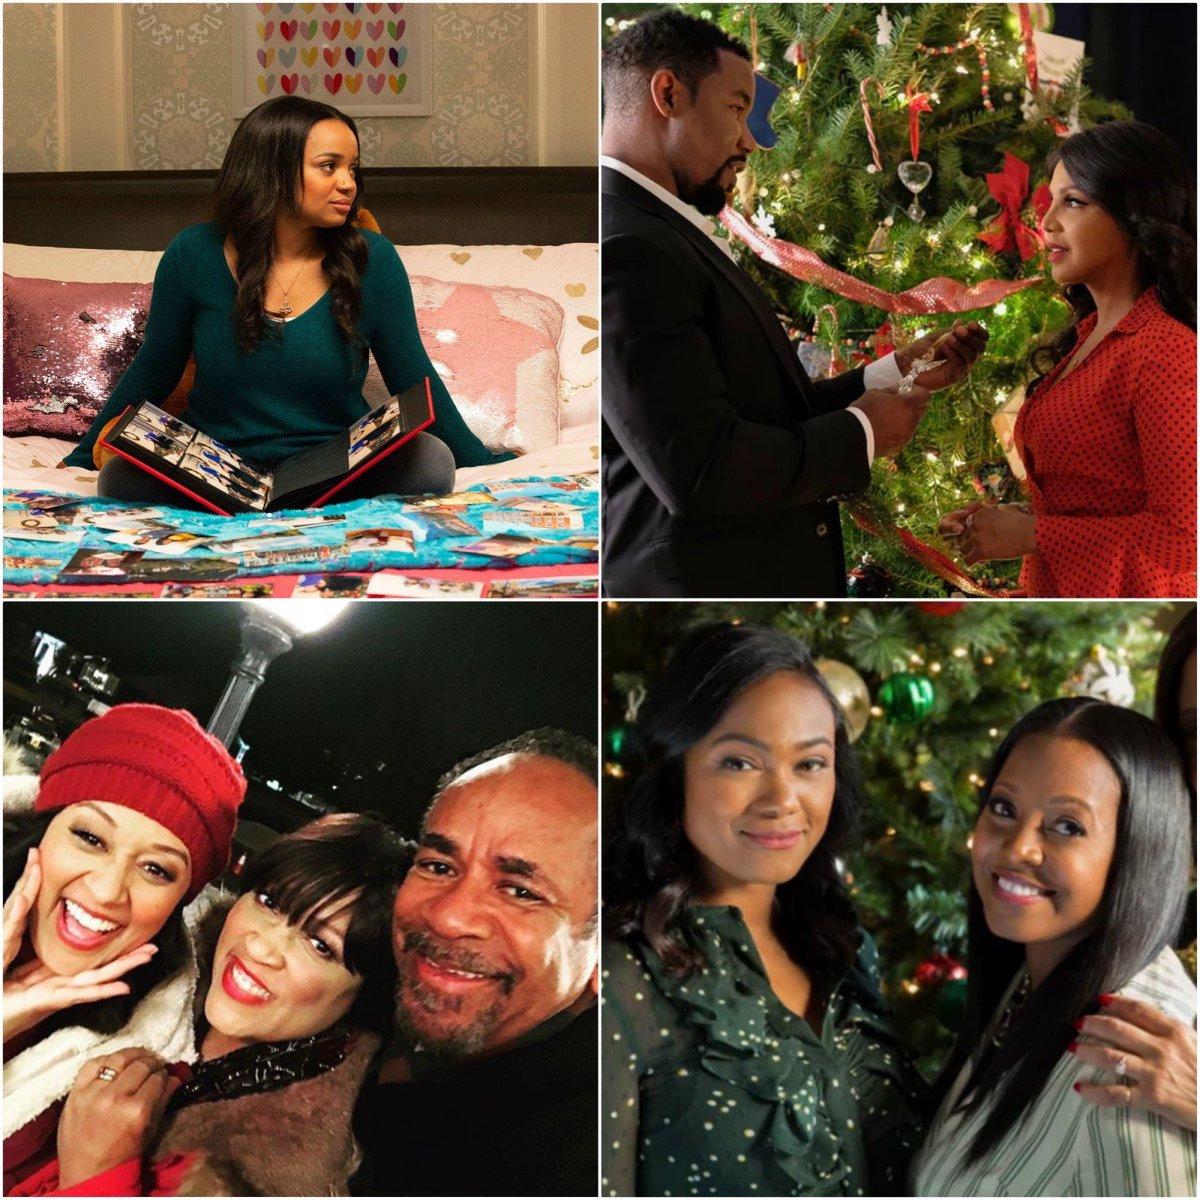 karen civil on twitter livecivil lifetime unveils 14 original christmas movies featuring kyla pratt toni braxton tia mowry hardict tatyana ali - Lifetime Christmas Movies